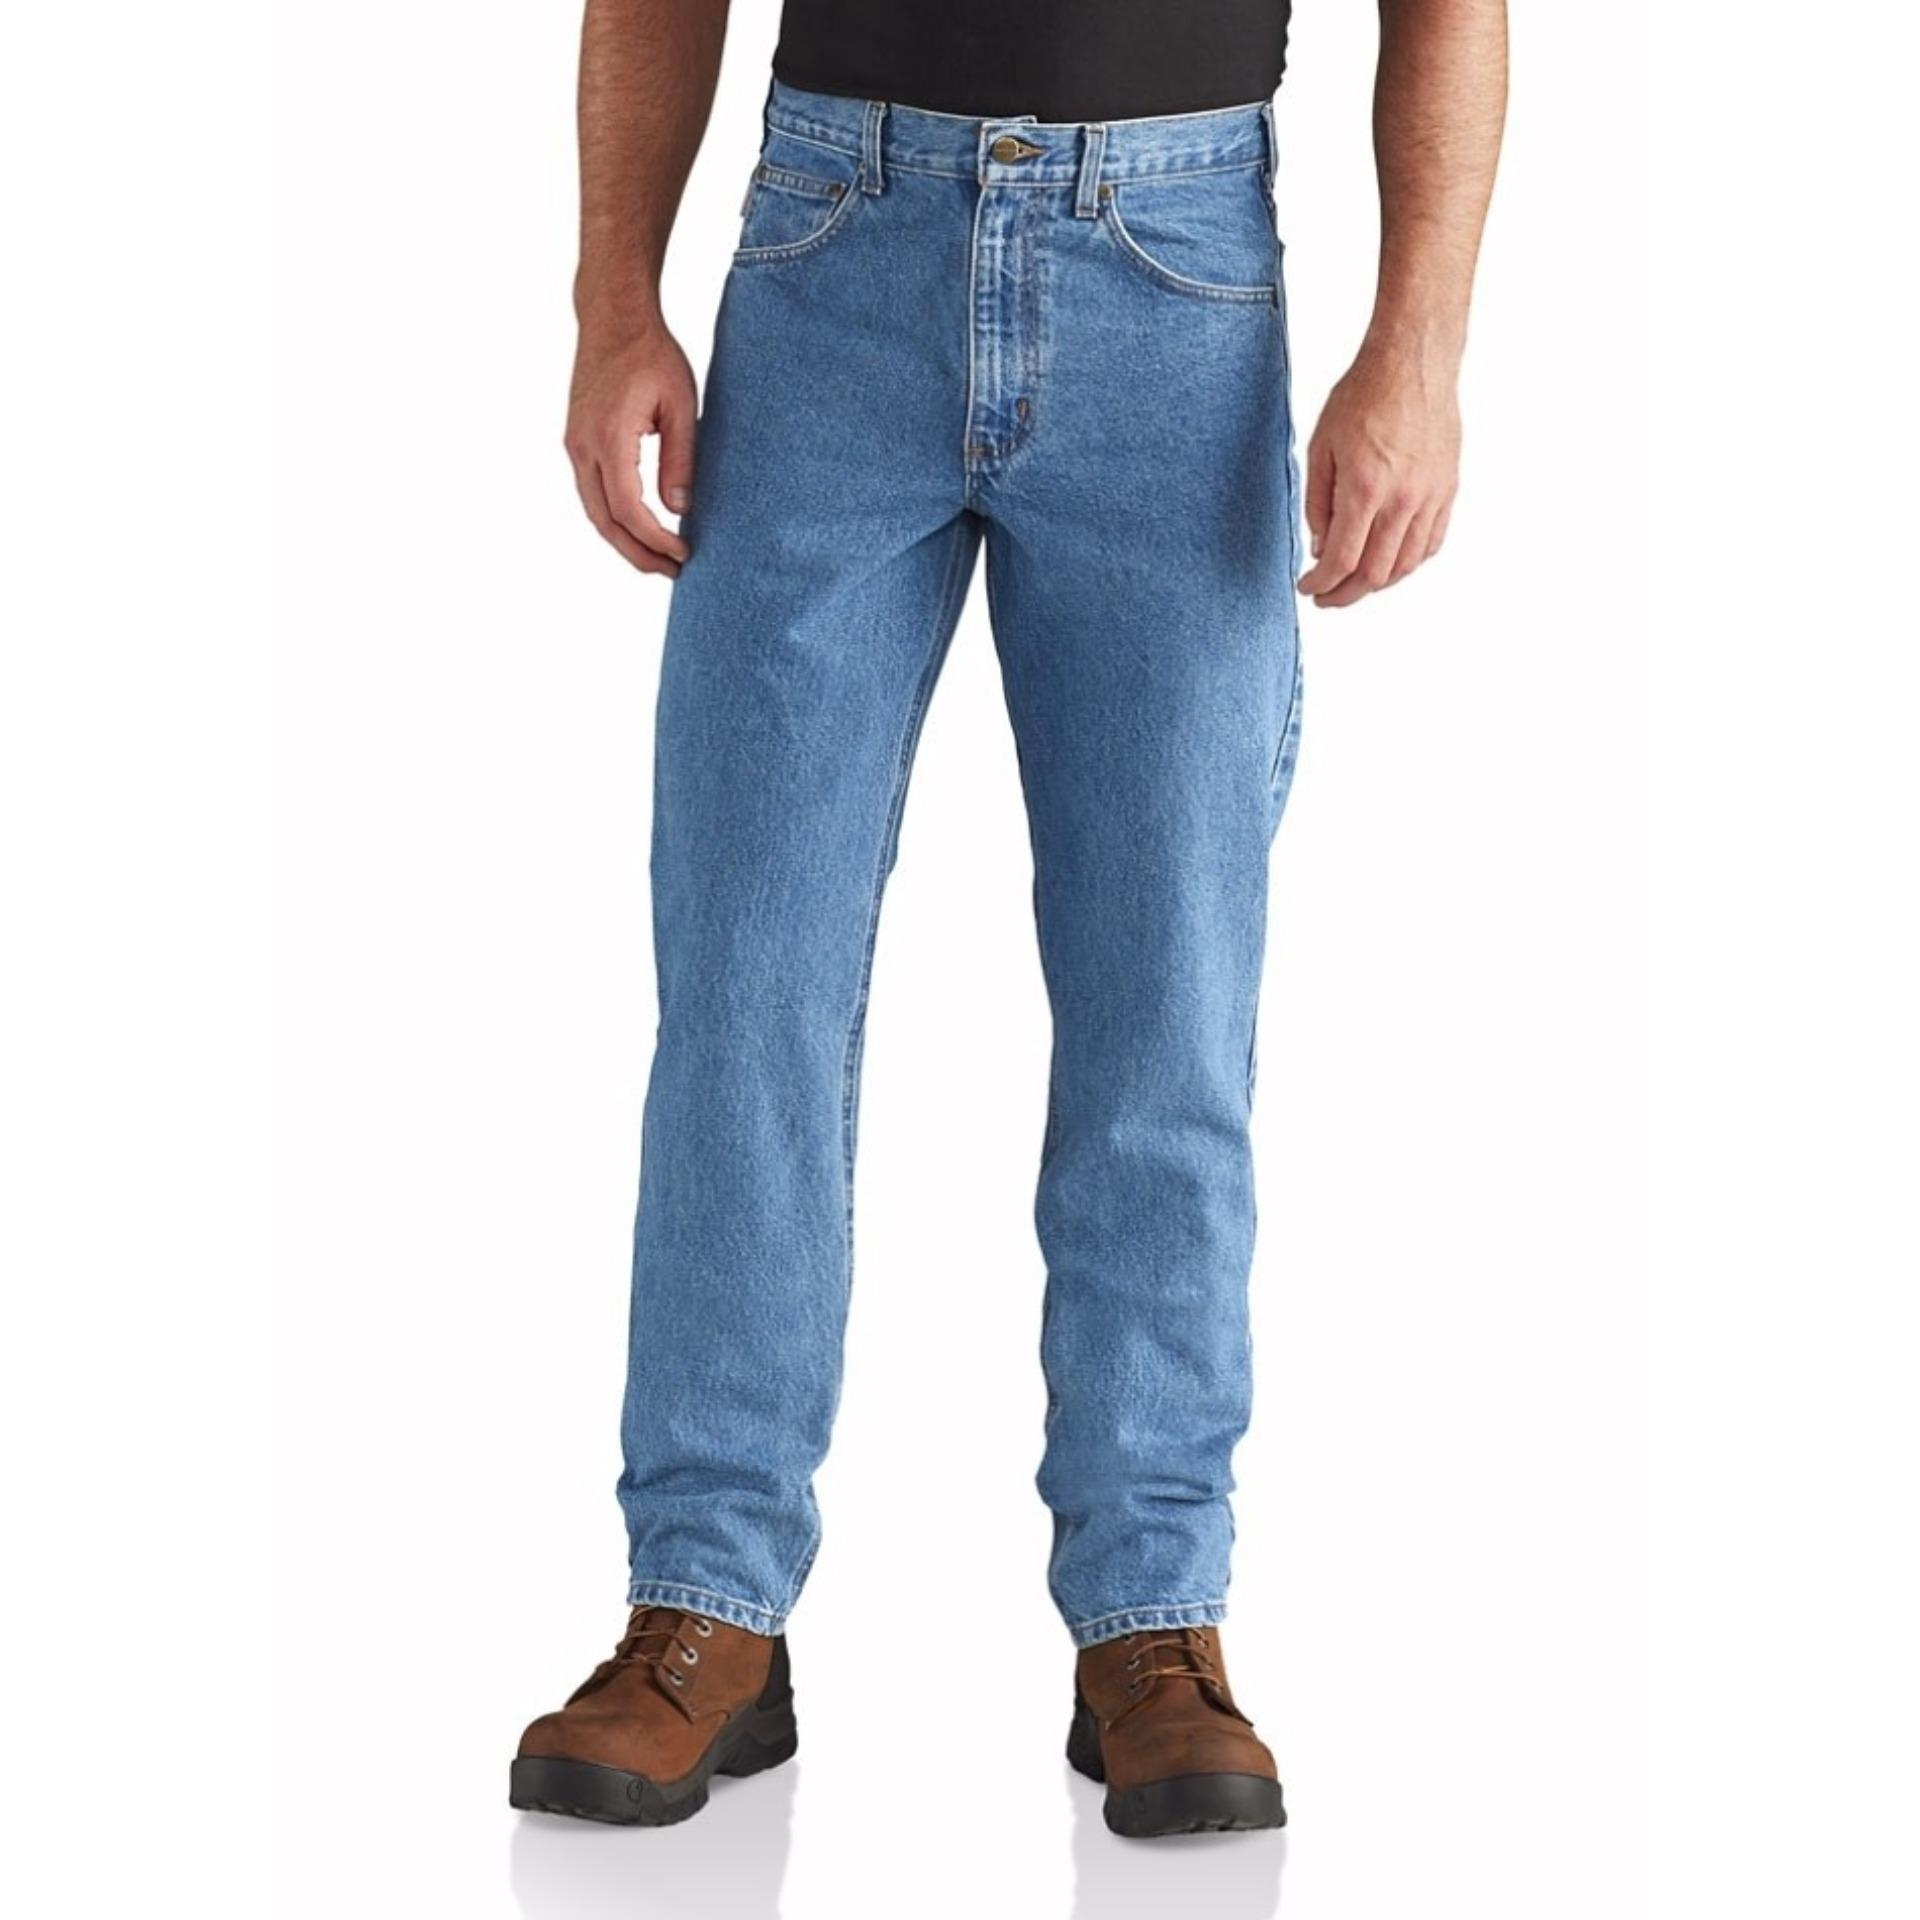 Situs Review Texan Celana Jeans Standard Pria Warna Biru Muda Light Blue Celana Jeans Big Size 33 34 35 36 37 38